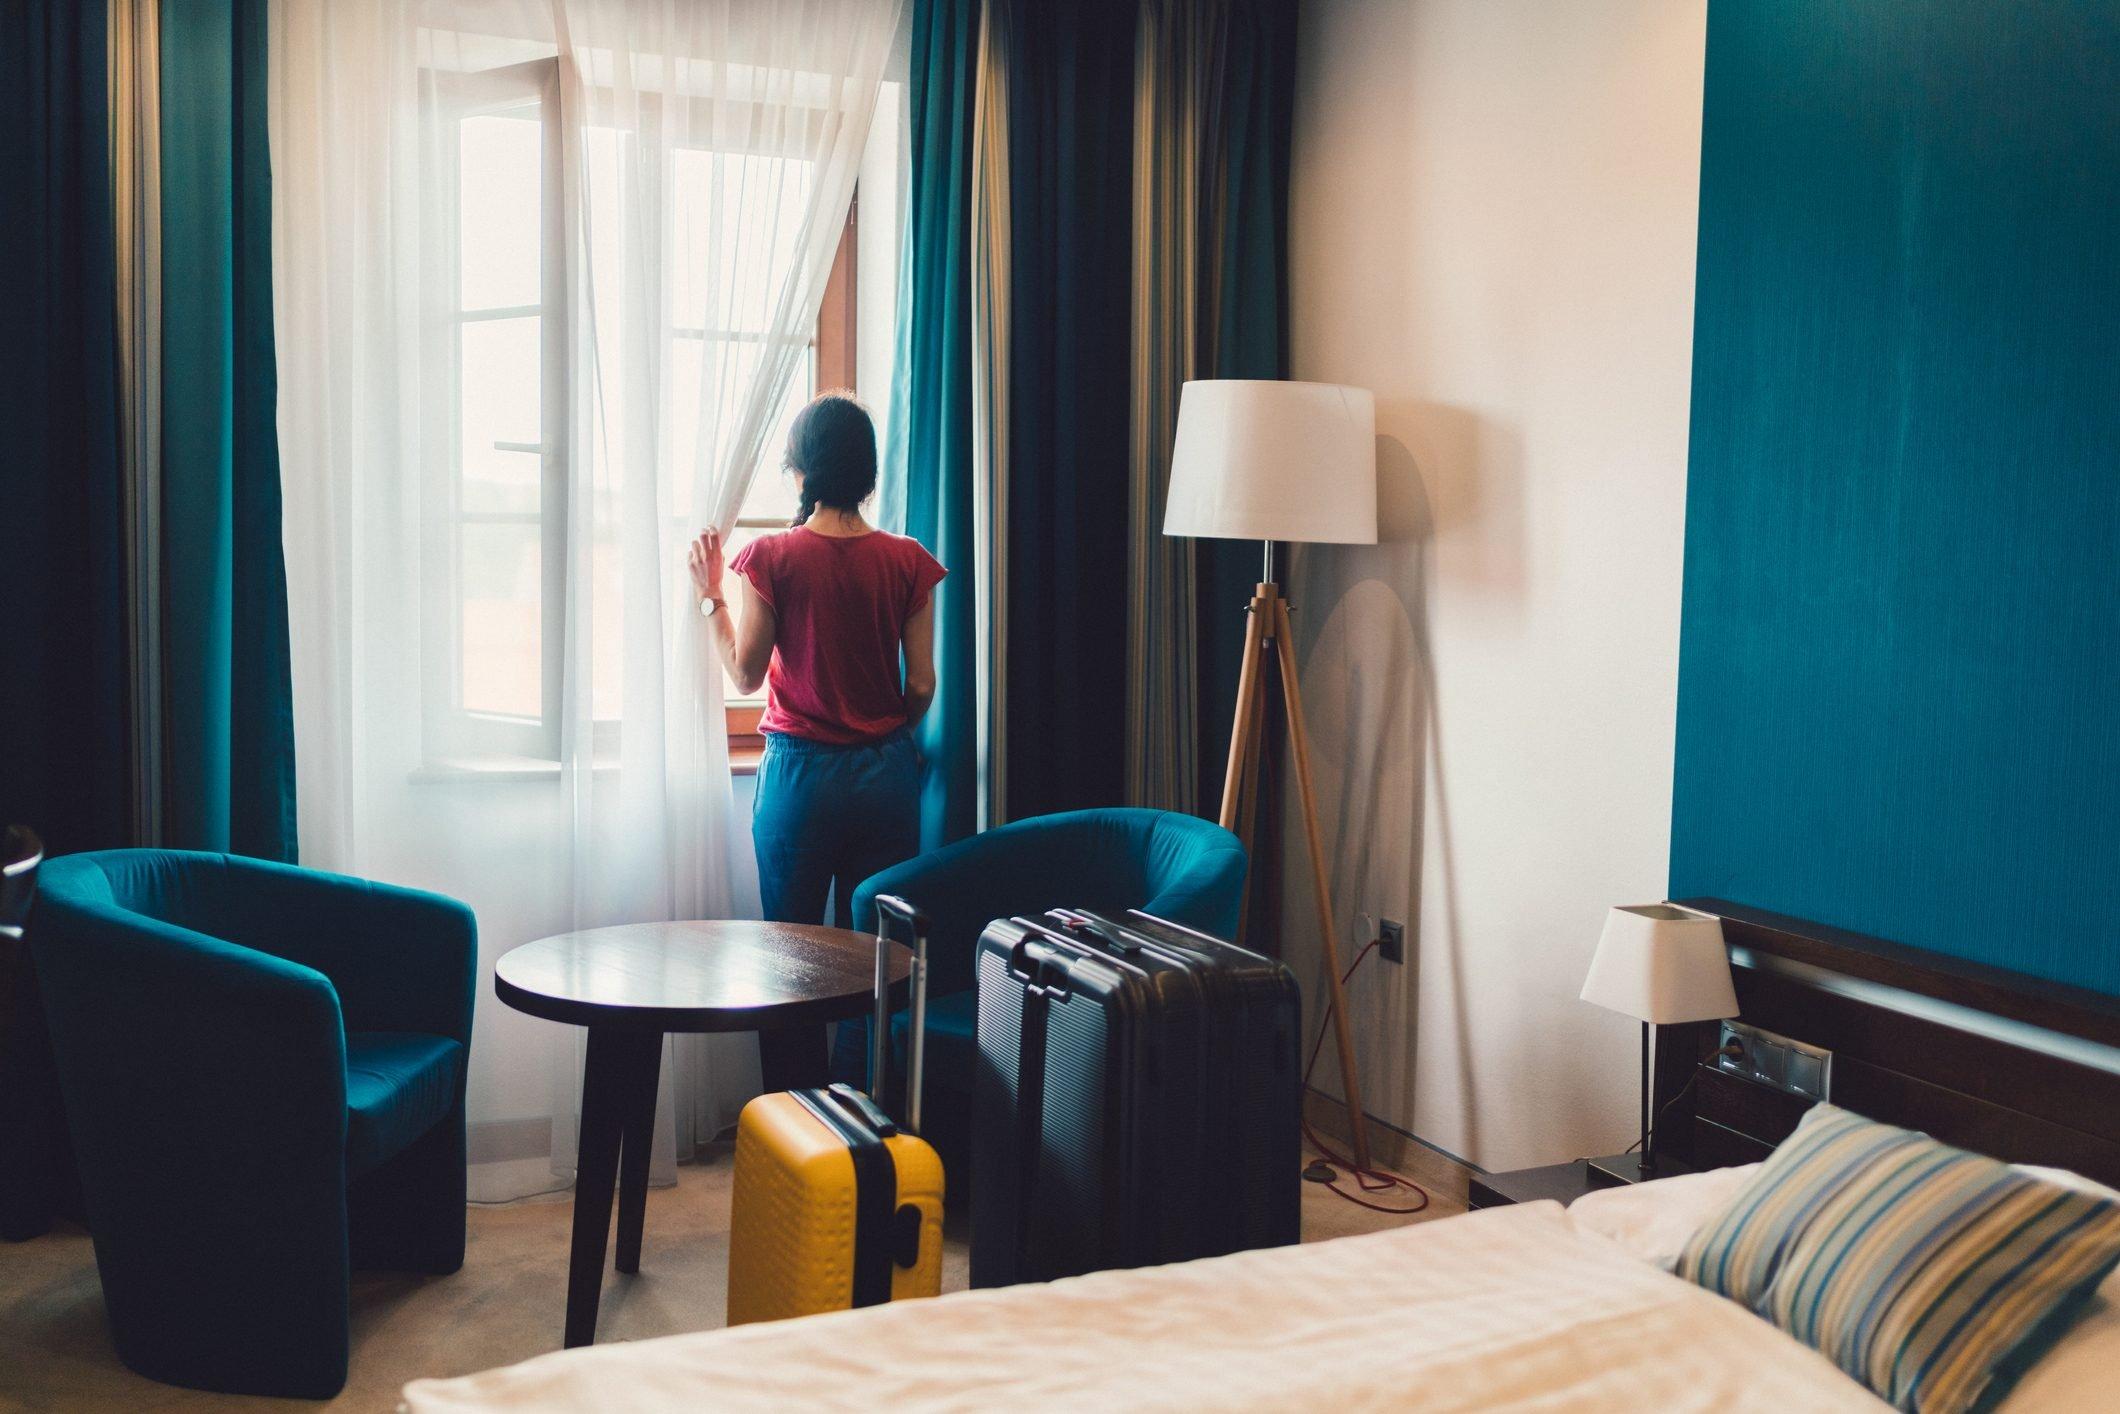 Tourist woman in luxury hotel